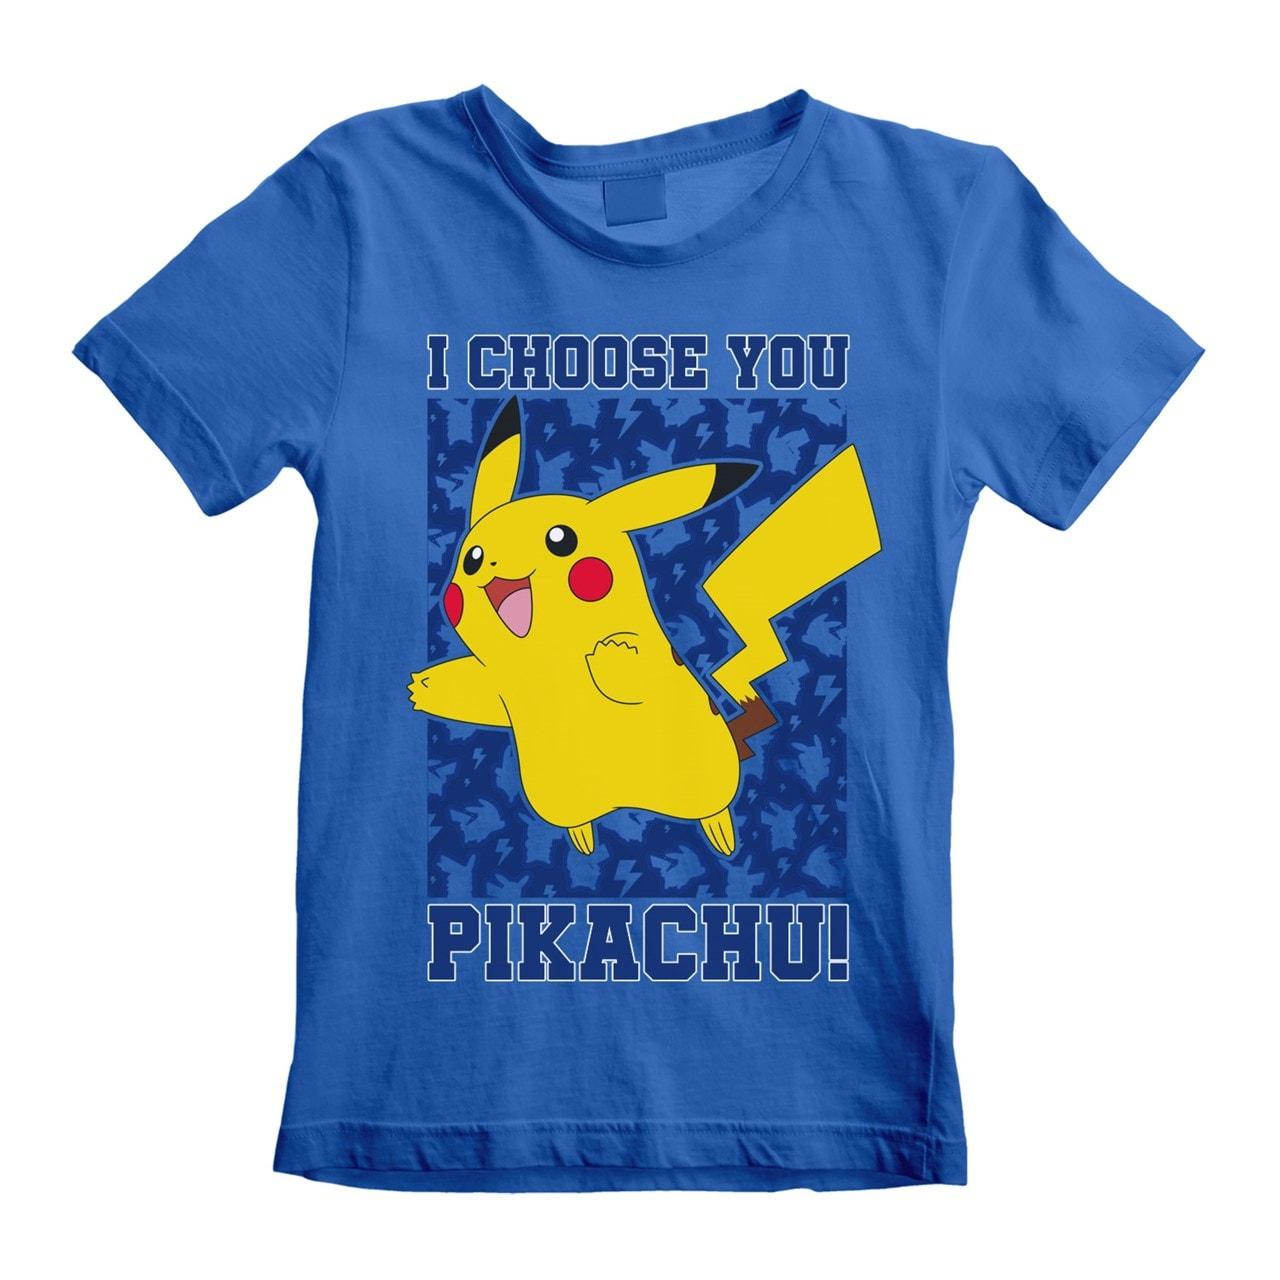 Pokemon: I Choose You! (Kids Tee) (3-4YR) - 1